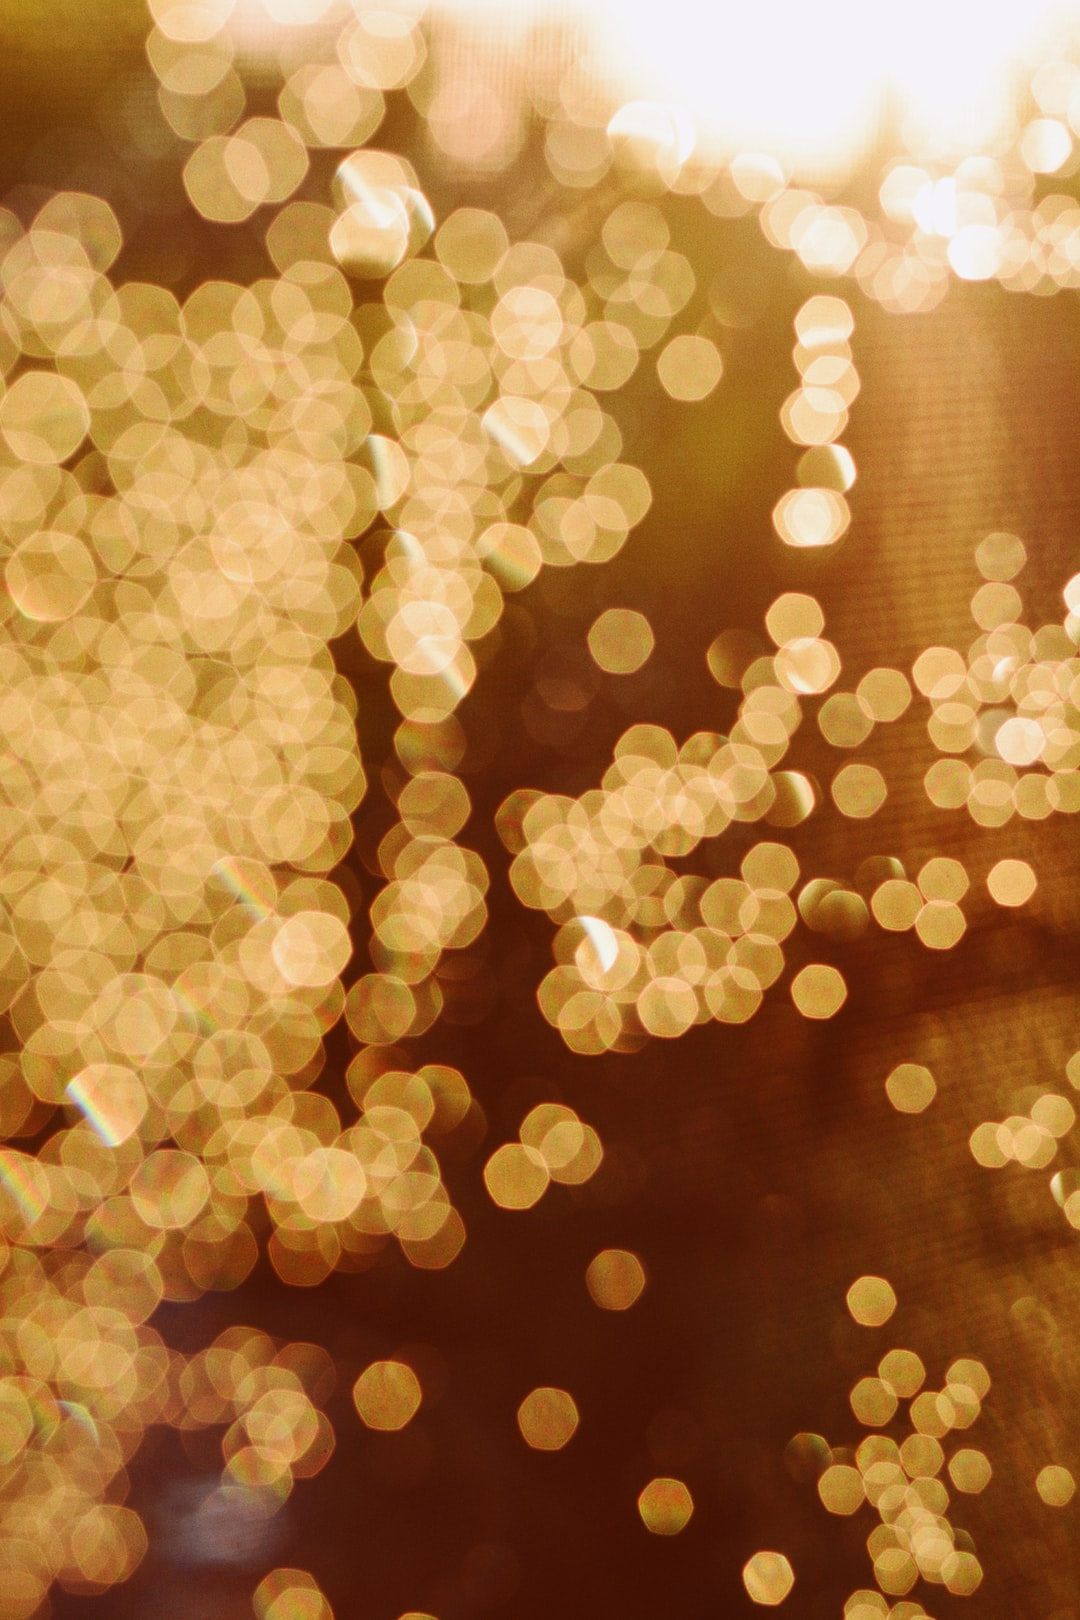 Best 20 Light Images Download Free Pictures On Unsplash